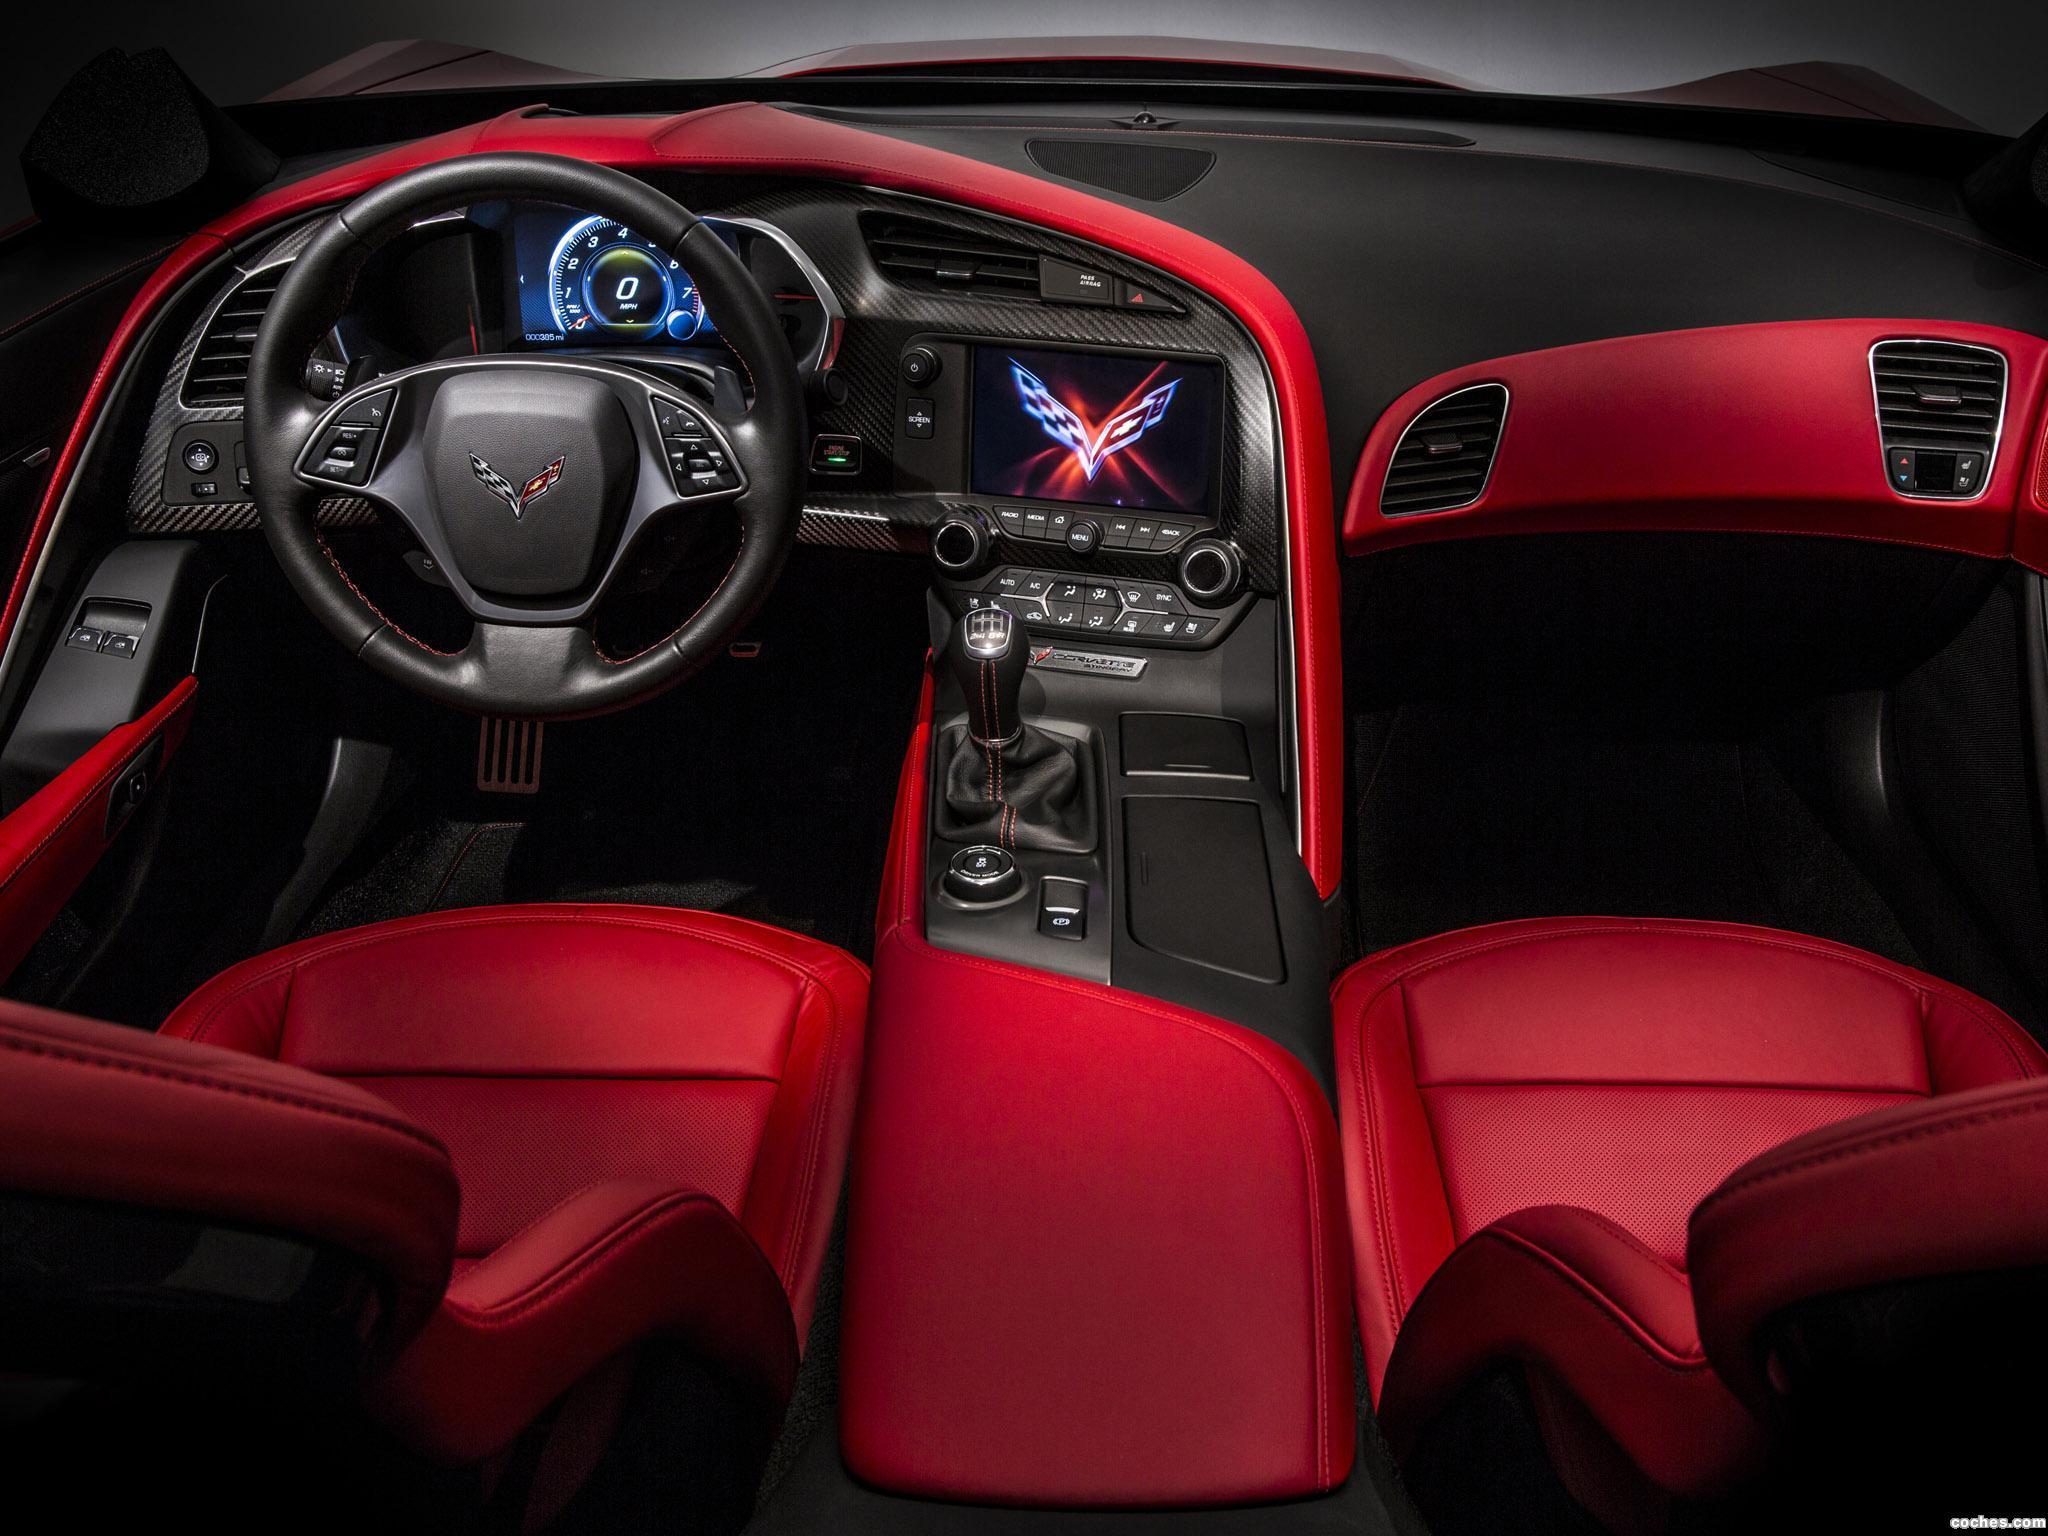 Foto 23 de Chevrolet Corvette Stingray C7 2014